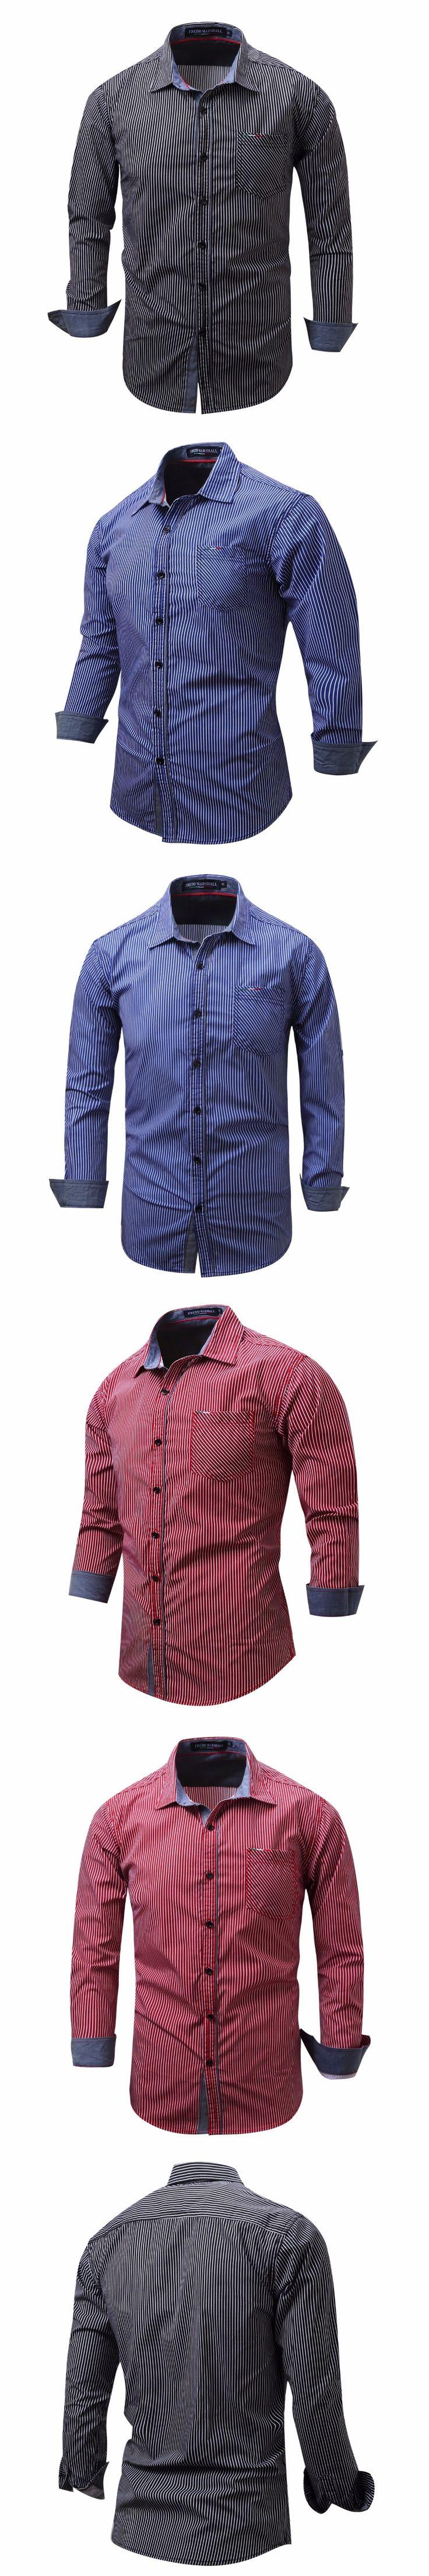 Fashion New 2017 Men Shirts Male Striped Formal Dress Shirt Long Sleeve Mens Brand Casual Shirts Plus Big Size US Size